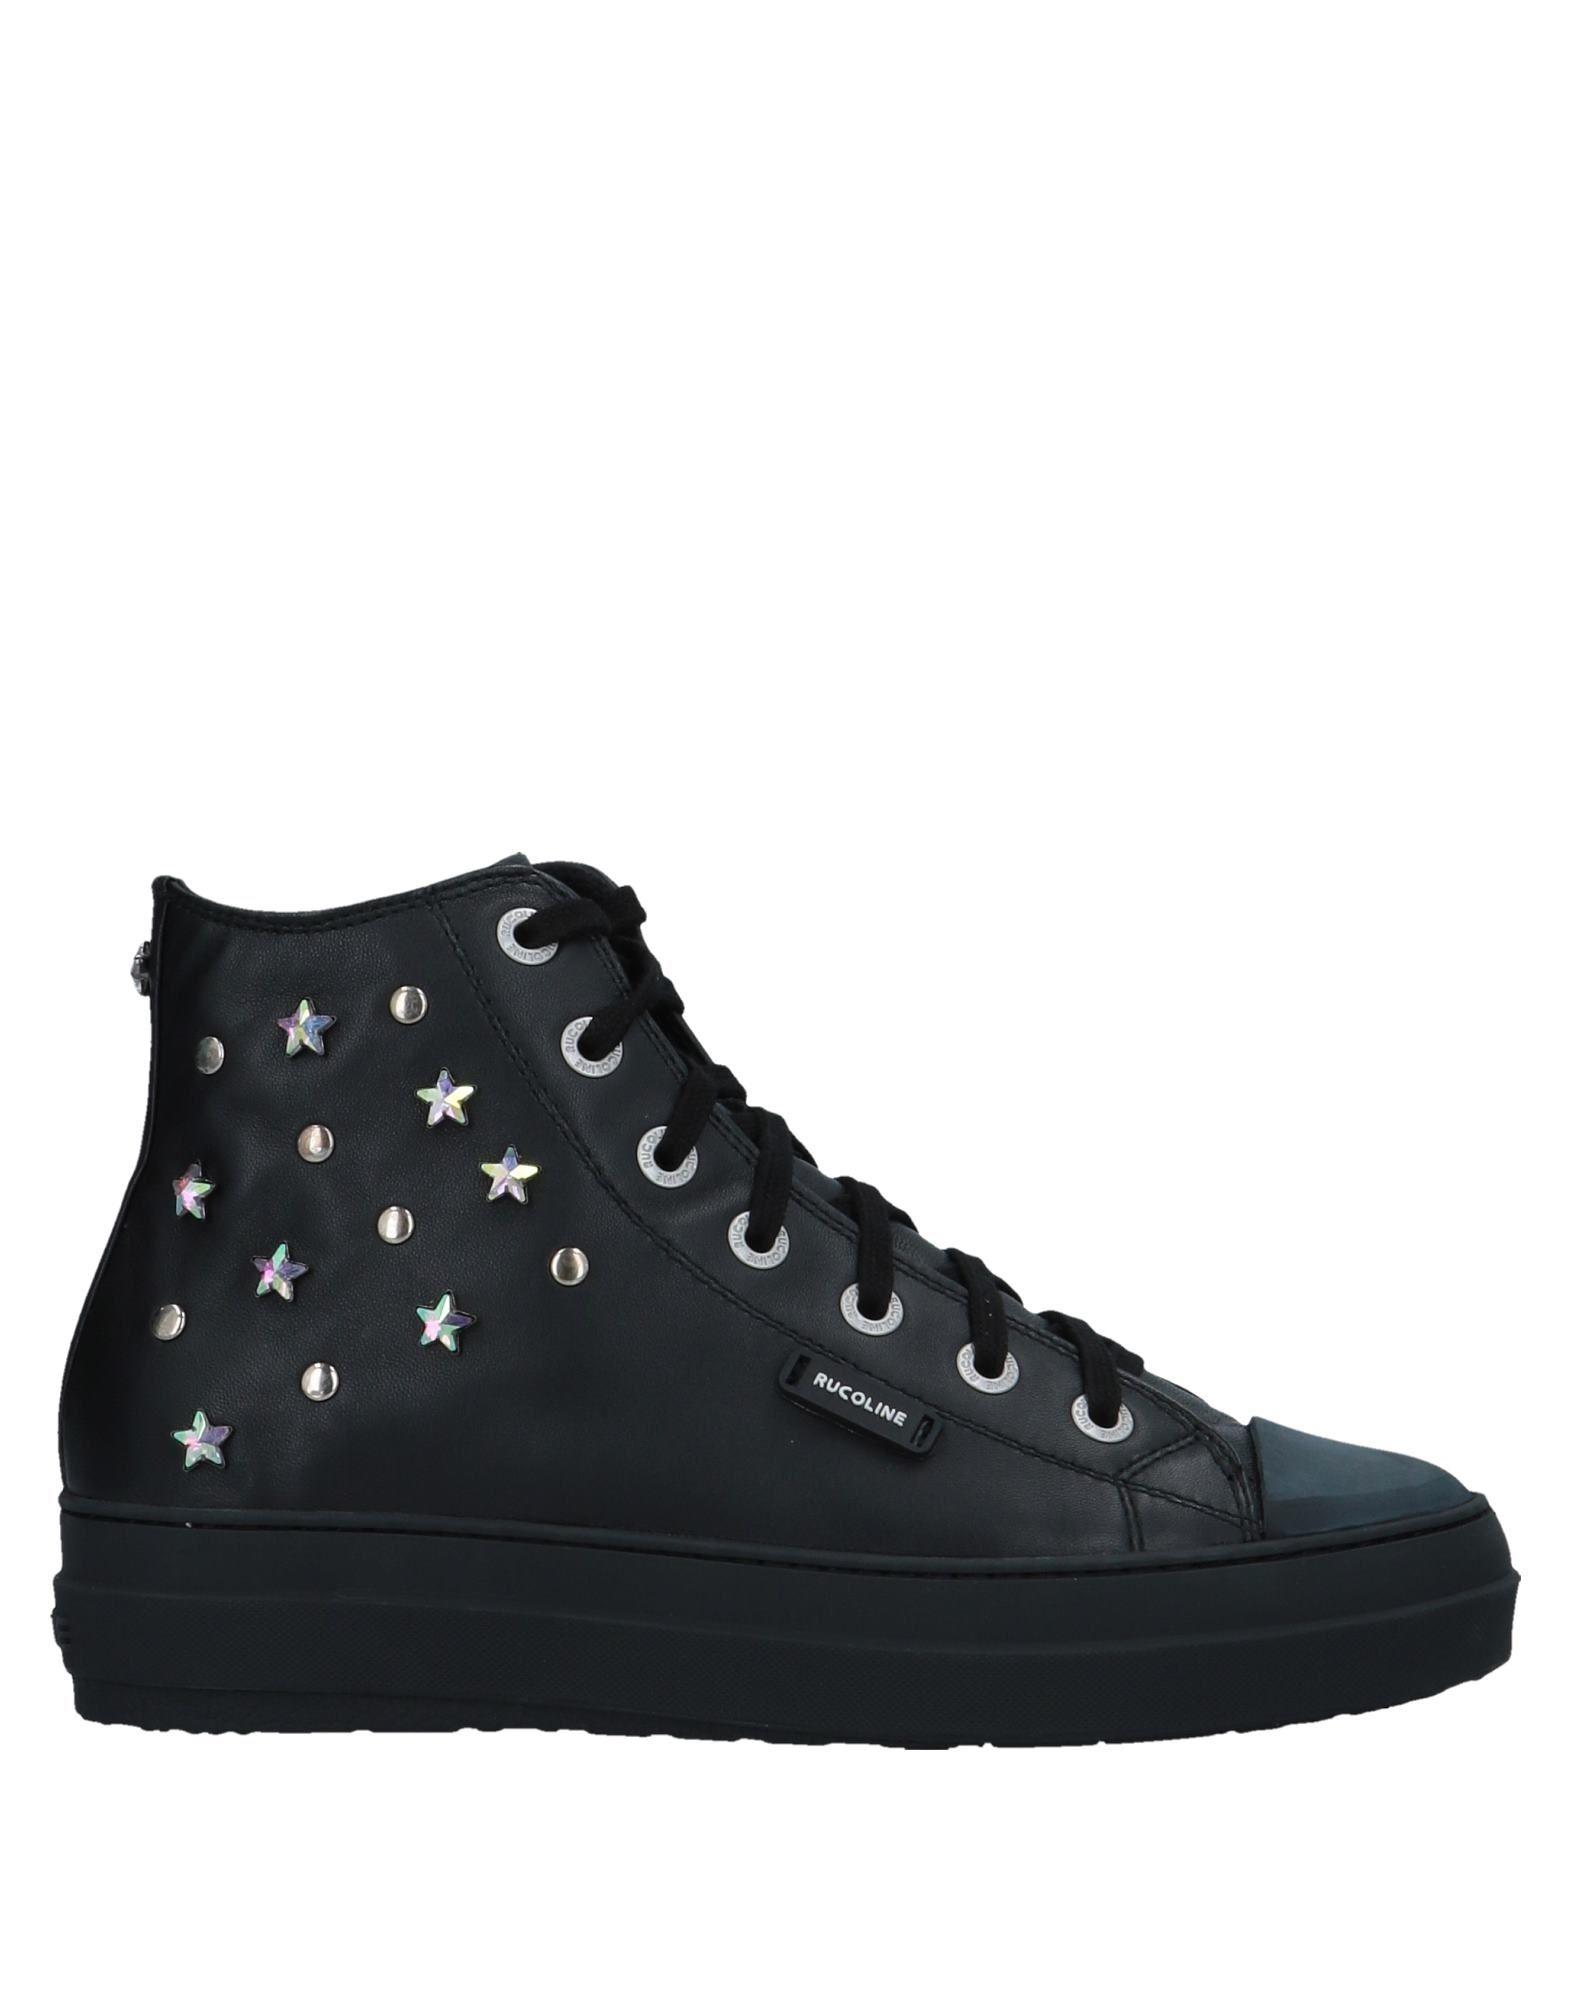 Stilvolle Sneakers billige Schuhe Ruco Line Sneakers Stilvolle Damen  11543943QD 25b56e